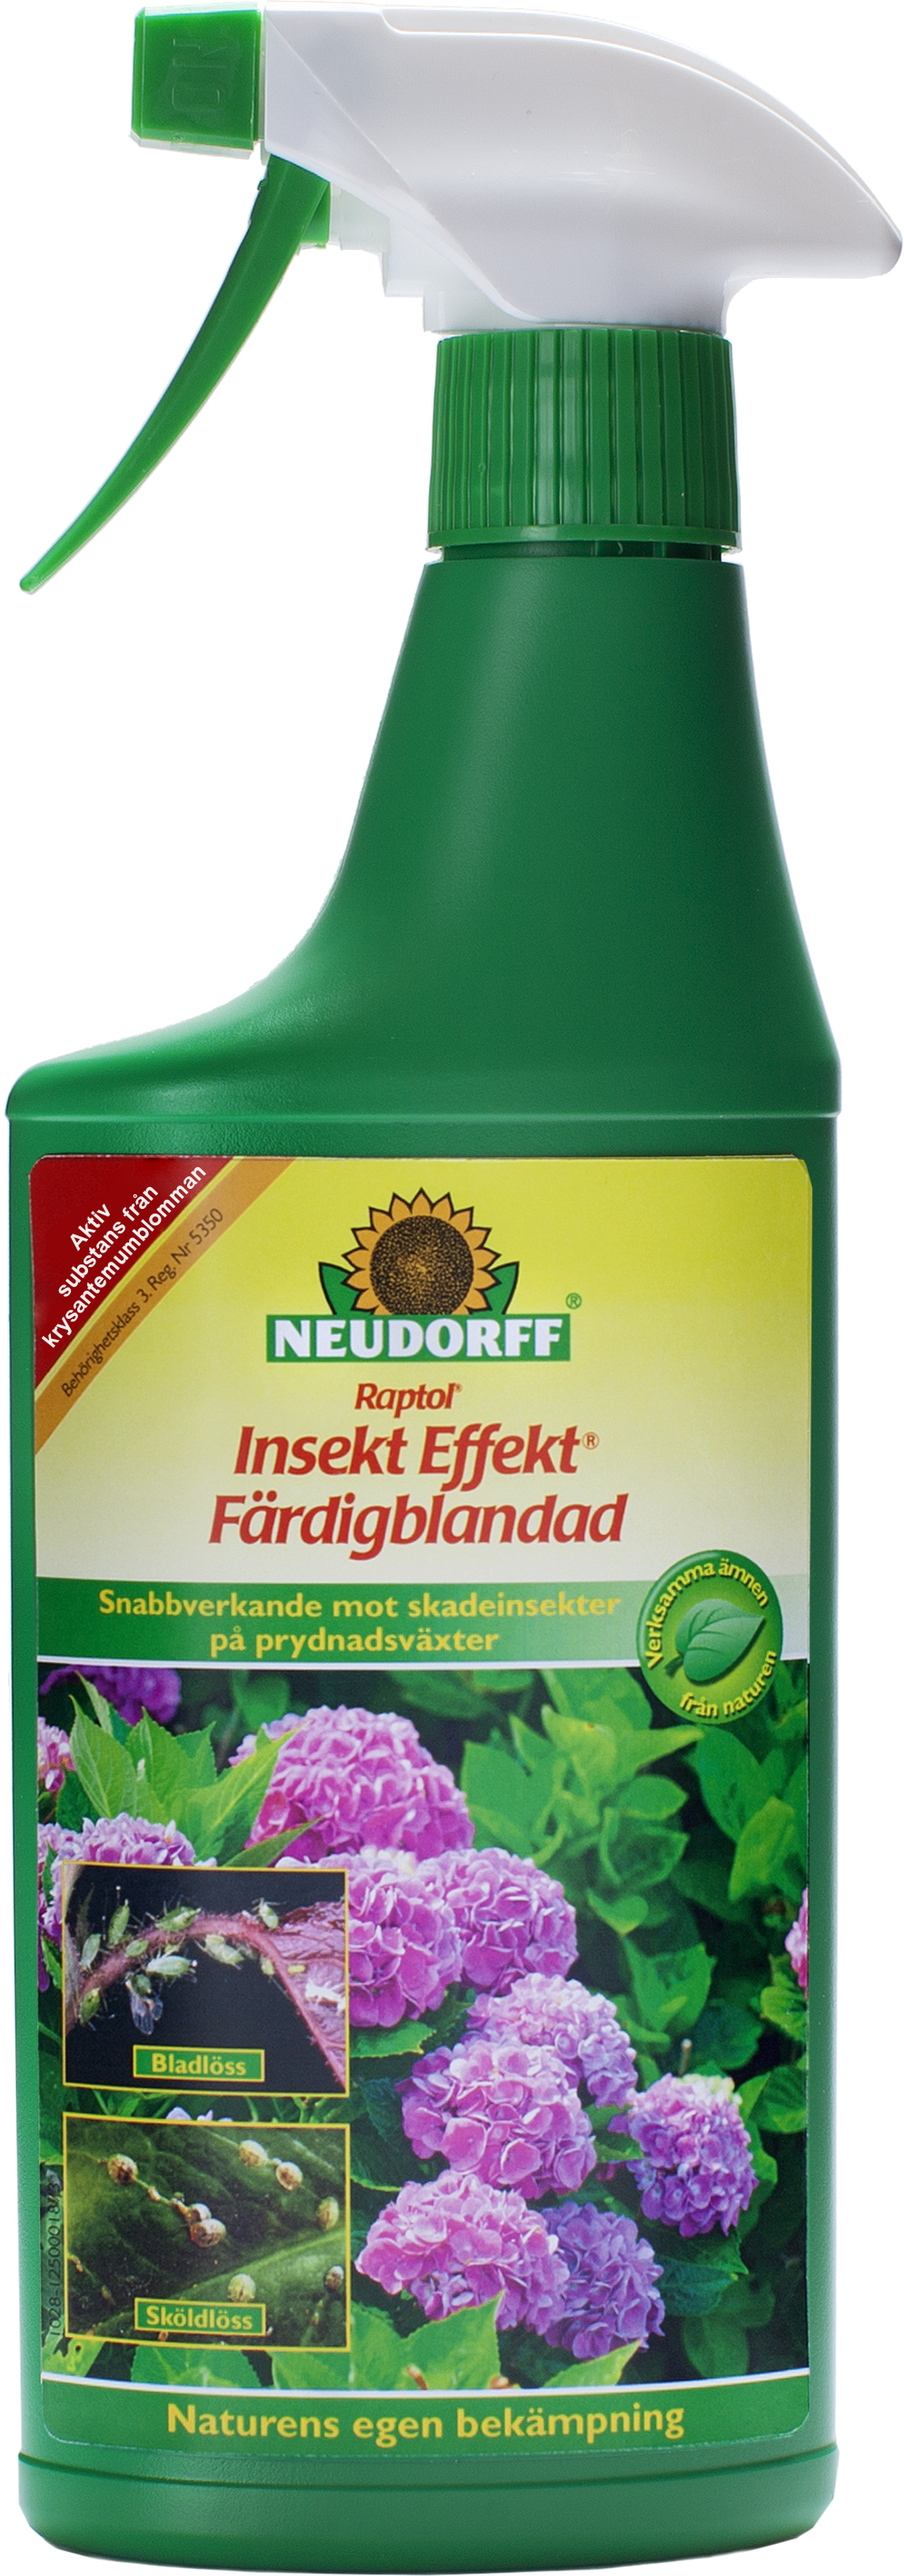 Produktbild på Insekt Effekt Raptol